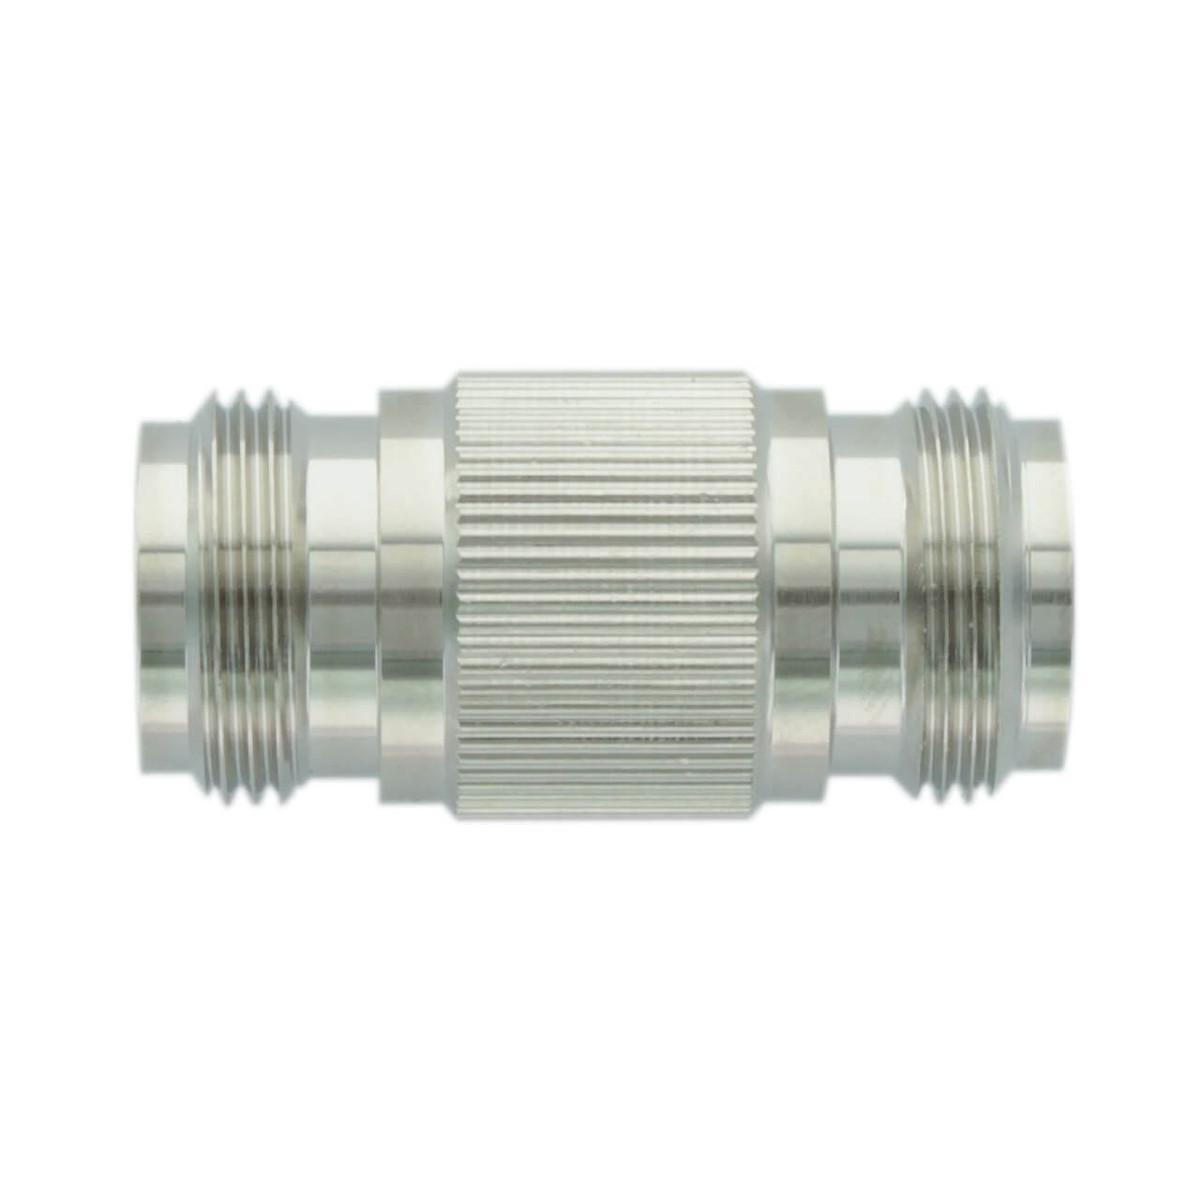 Bolton Technical N-Female to N-Female Barrel Connector